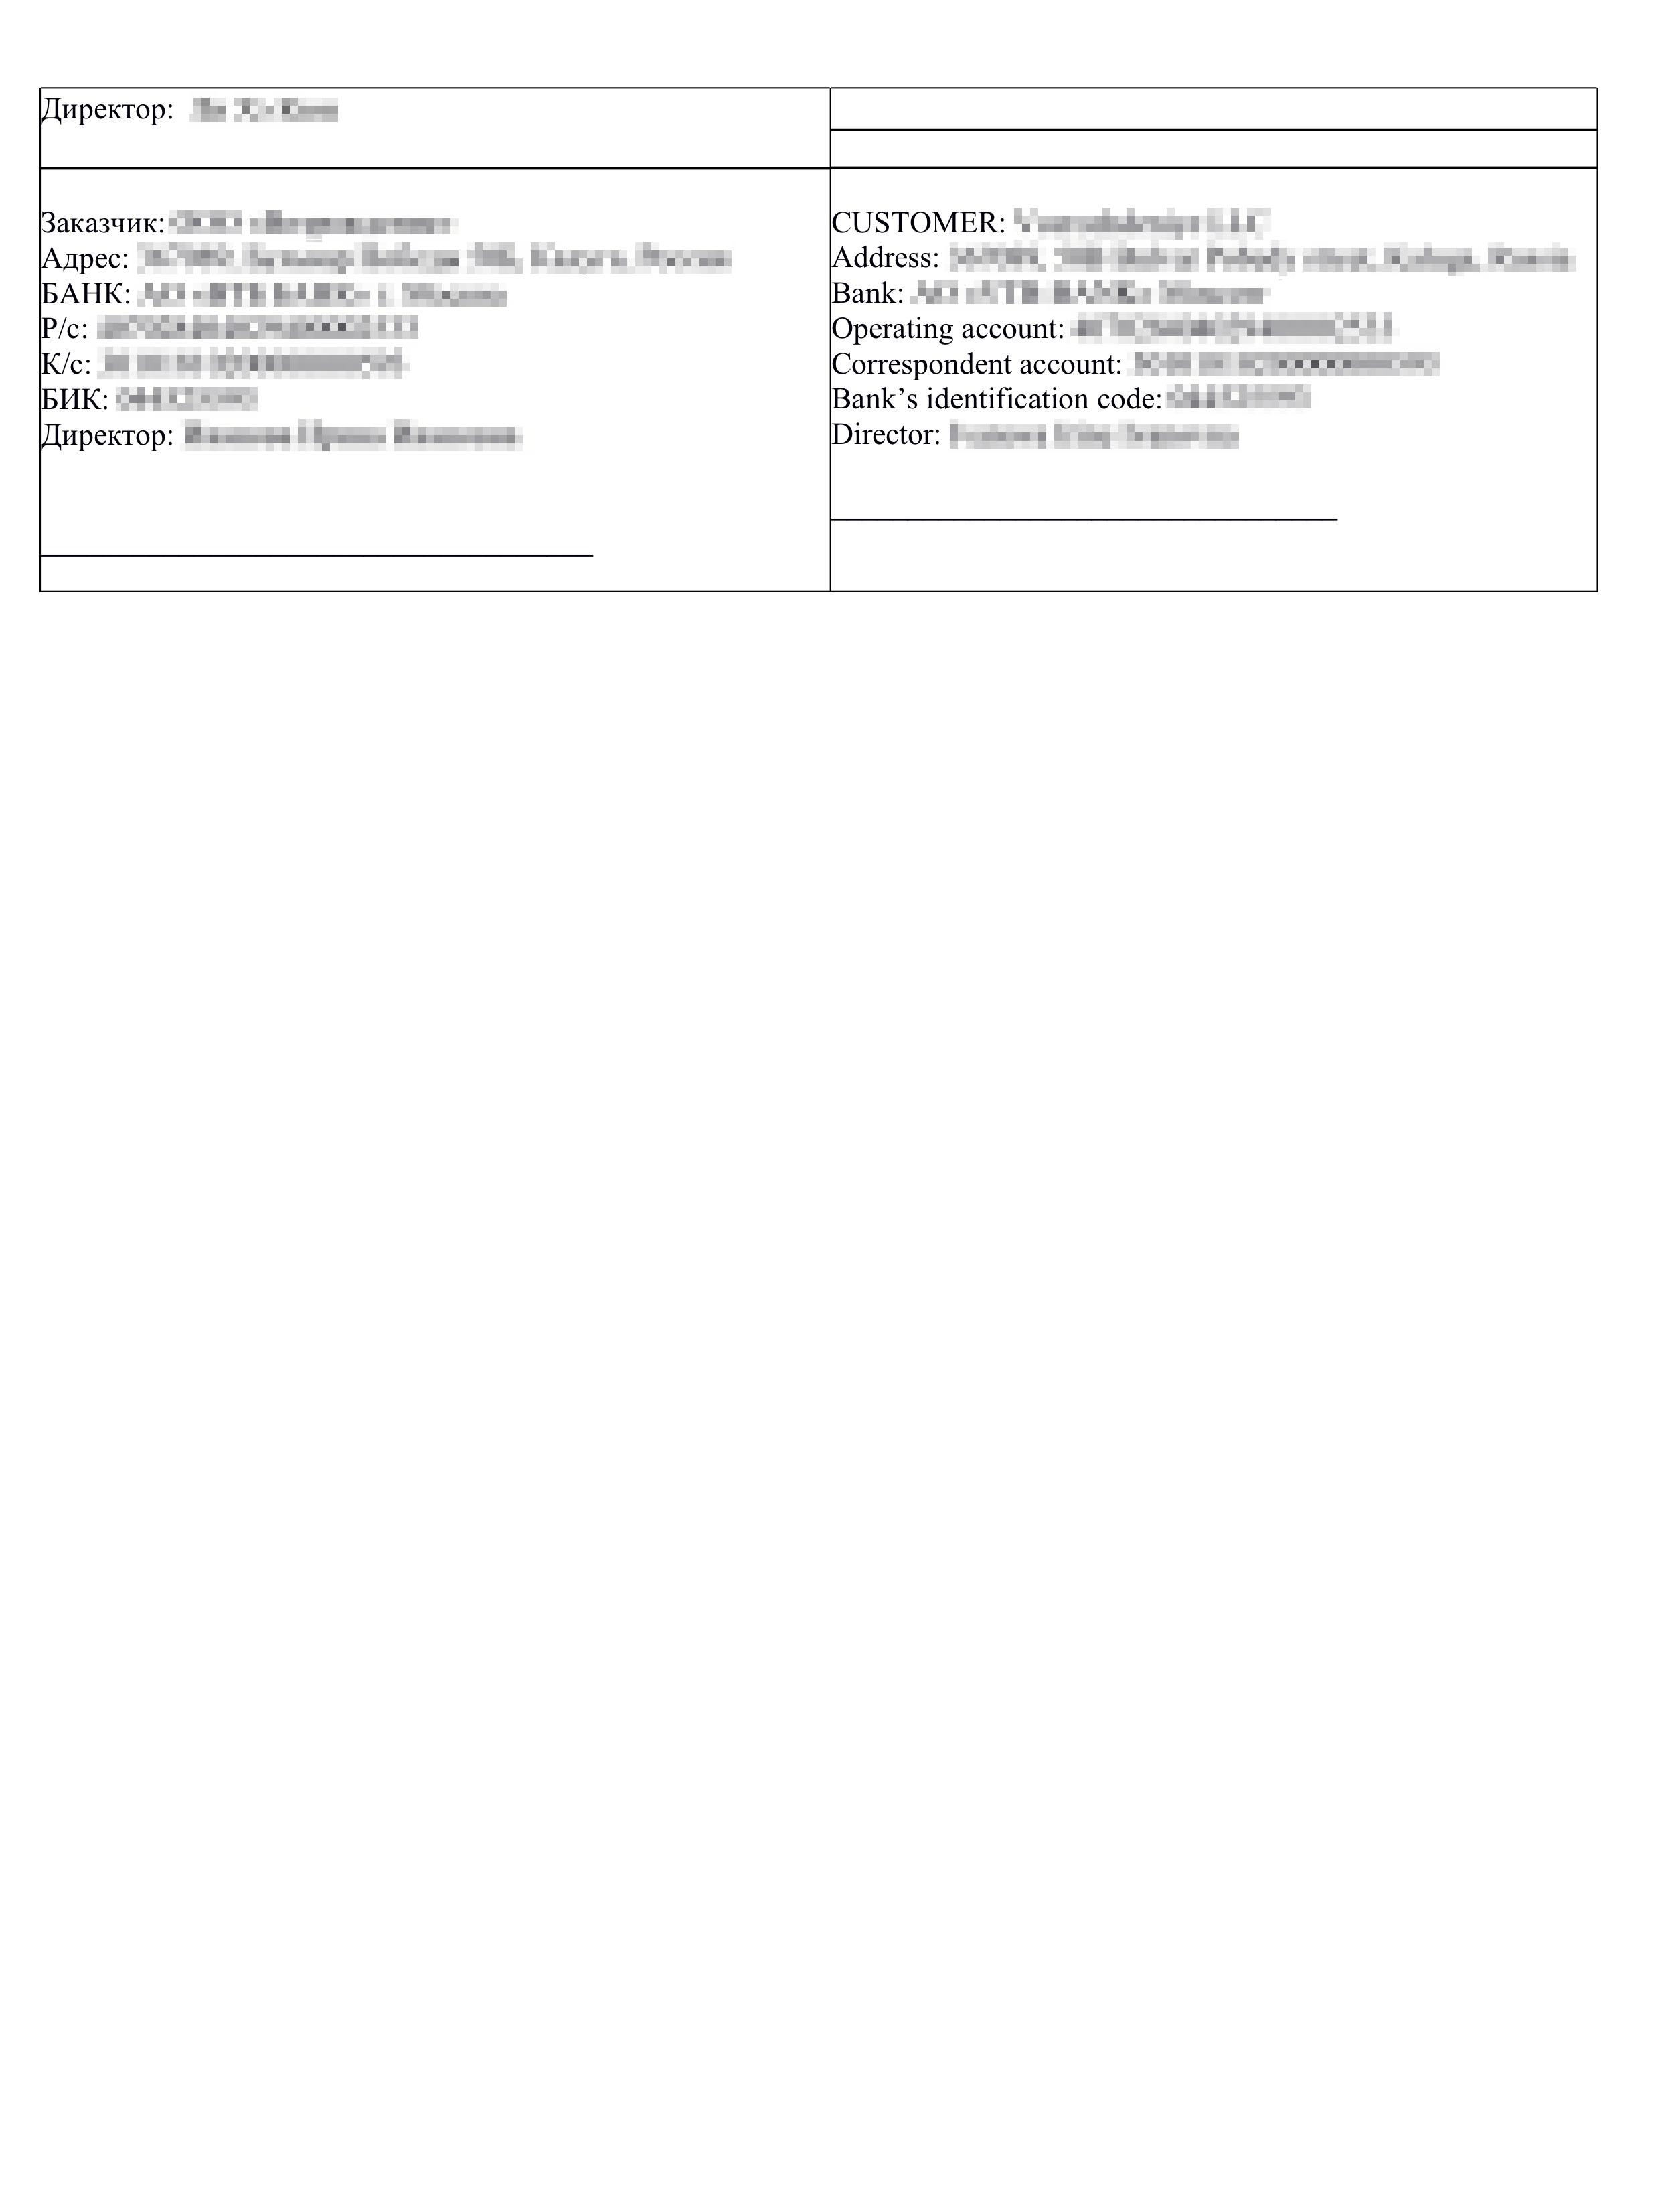 Контракт на поставку мебели изЮжной Кореи. Базис поставки — EXW — зафиксирован впунктах1и2